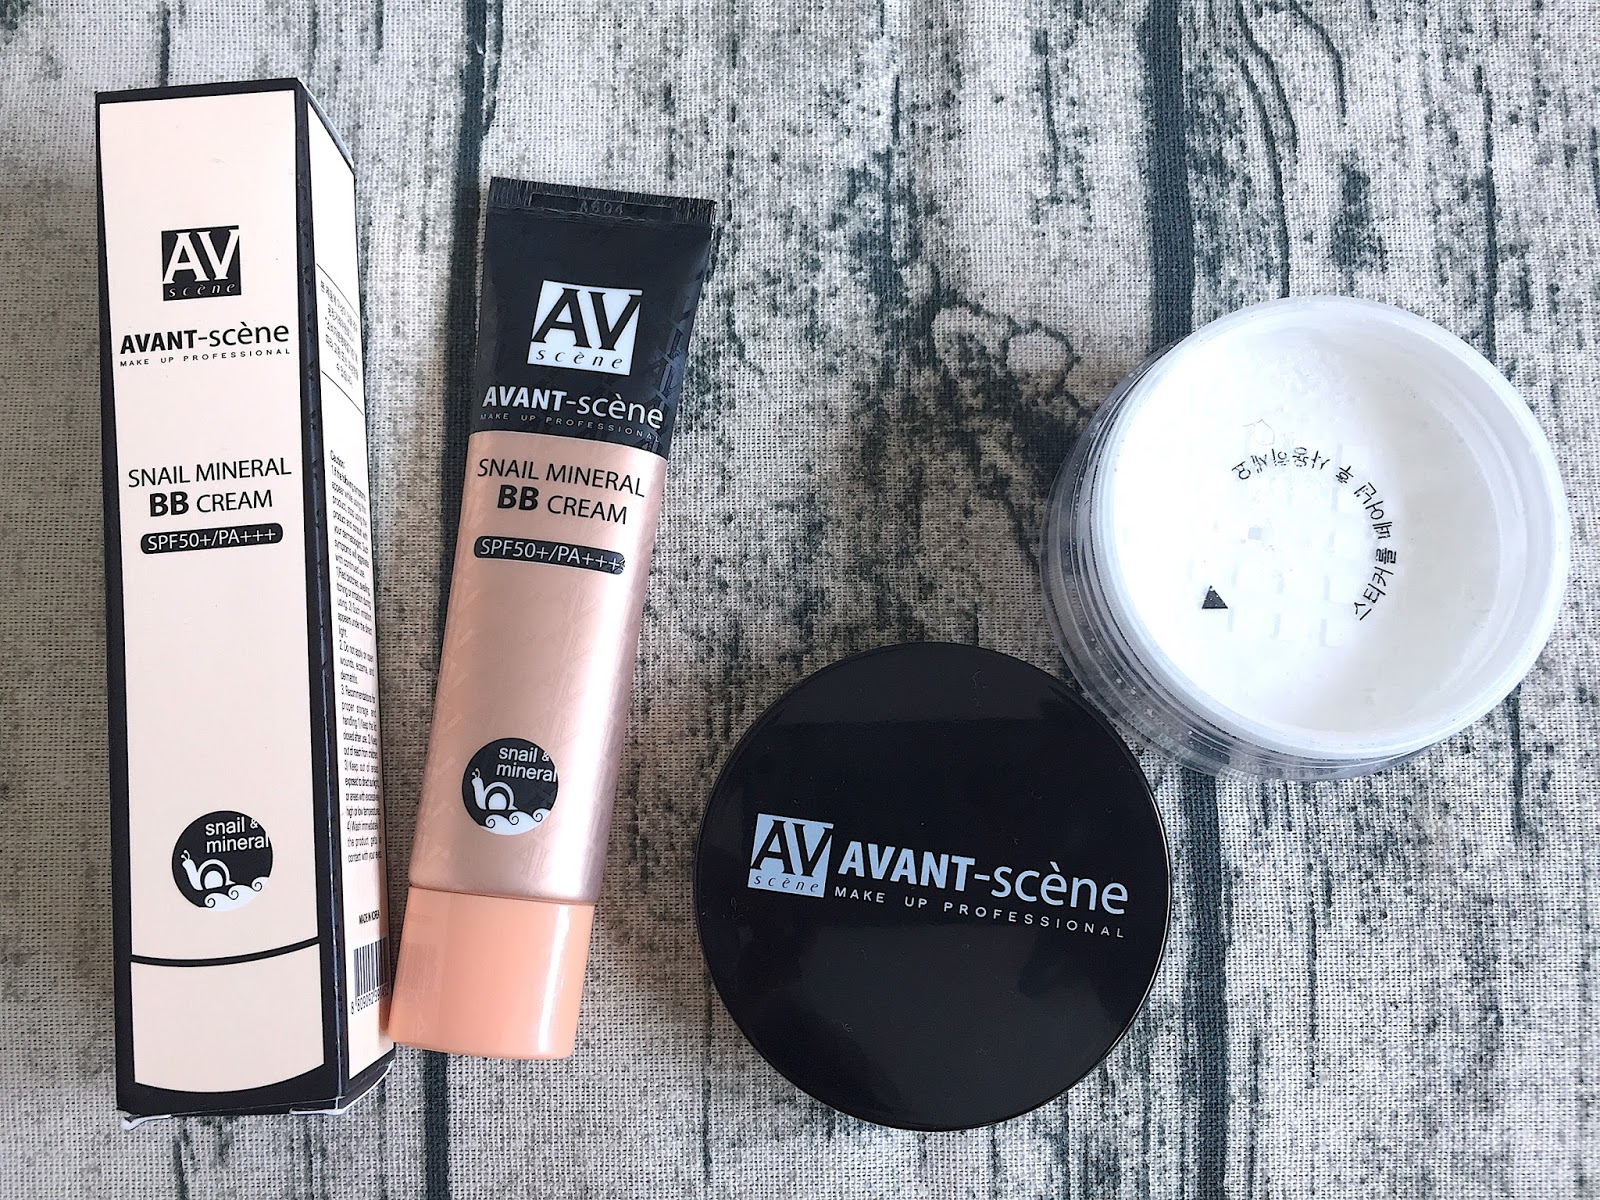 Makeup Secret: 韓國化妝師指定選用的化妝品牌「AVANT-scéne」